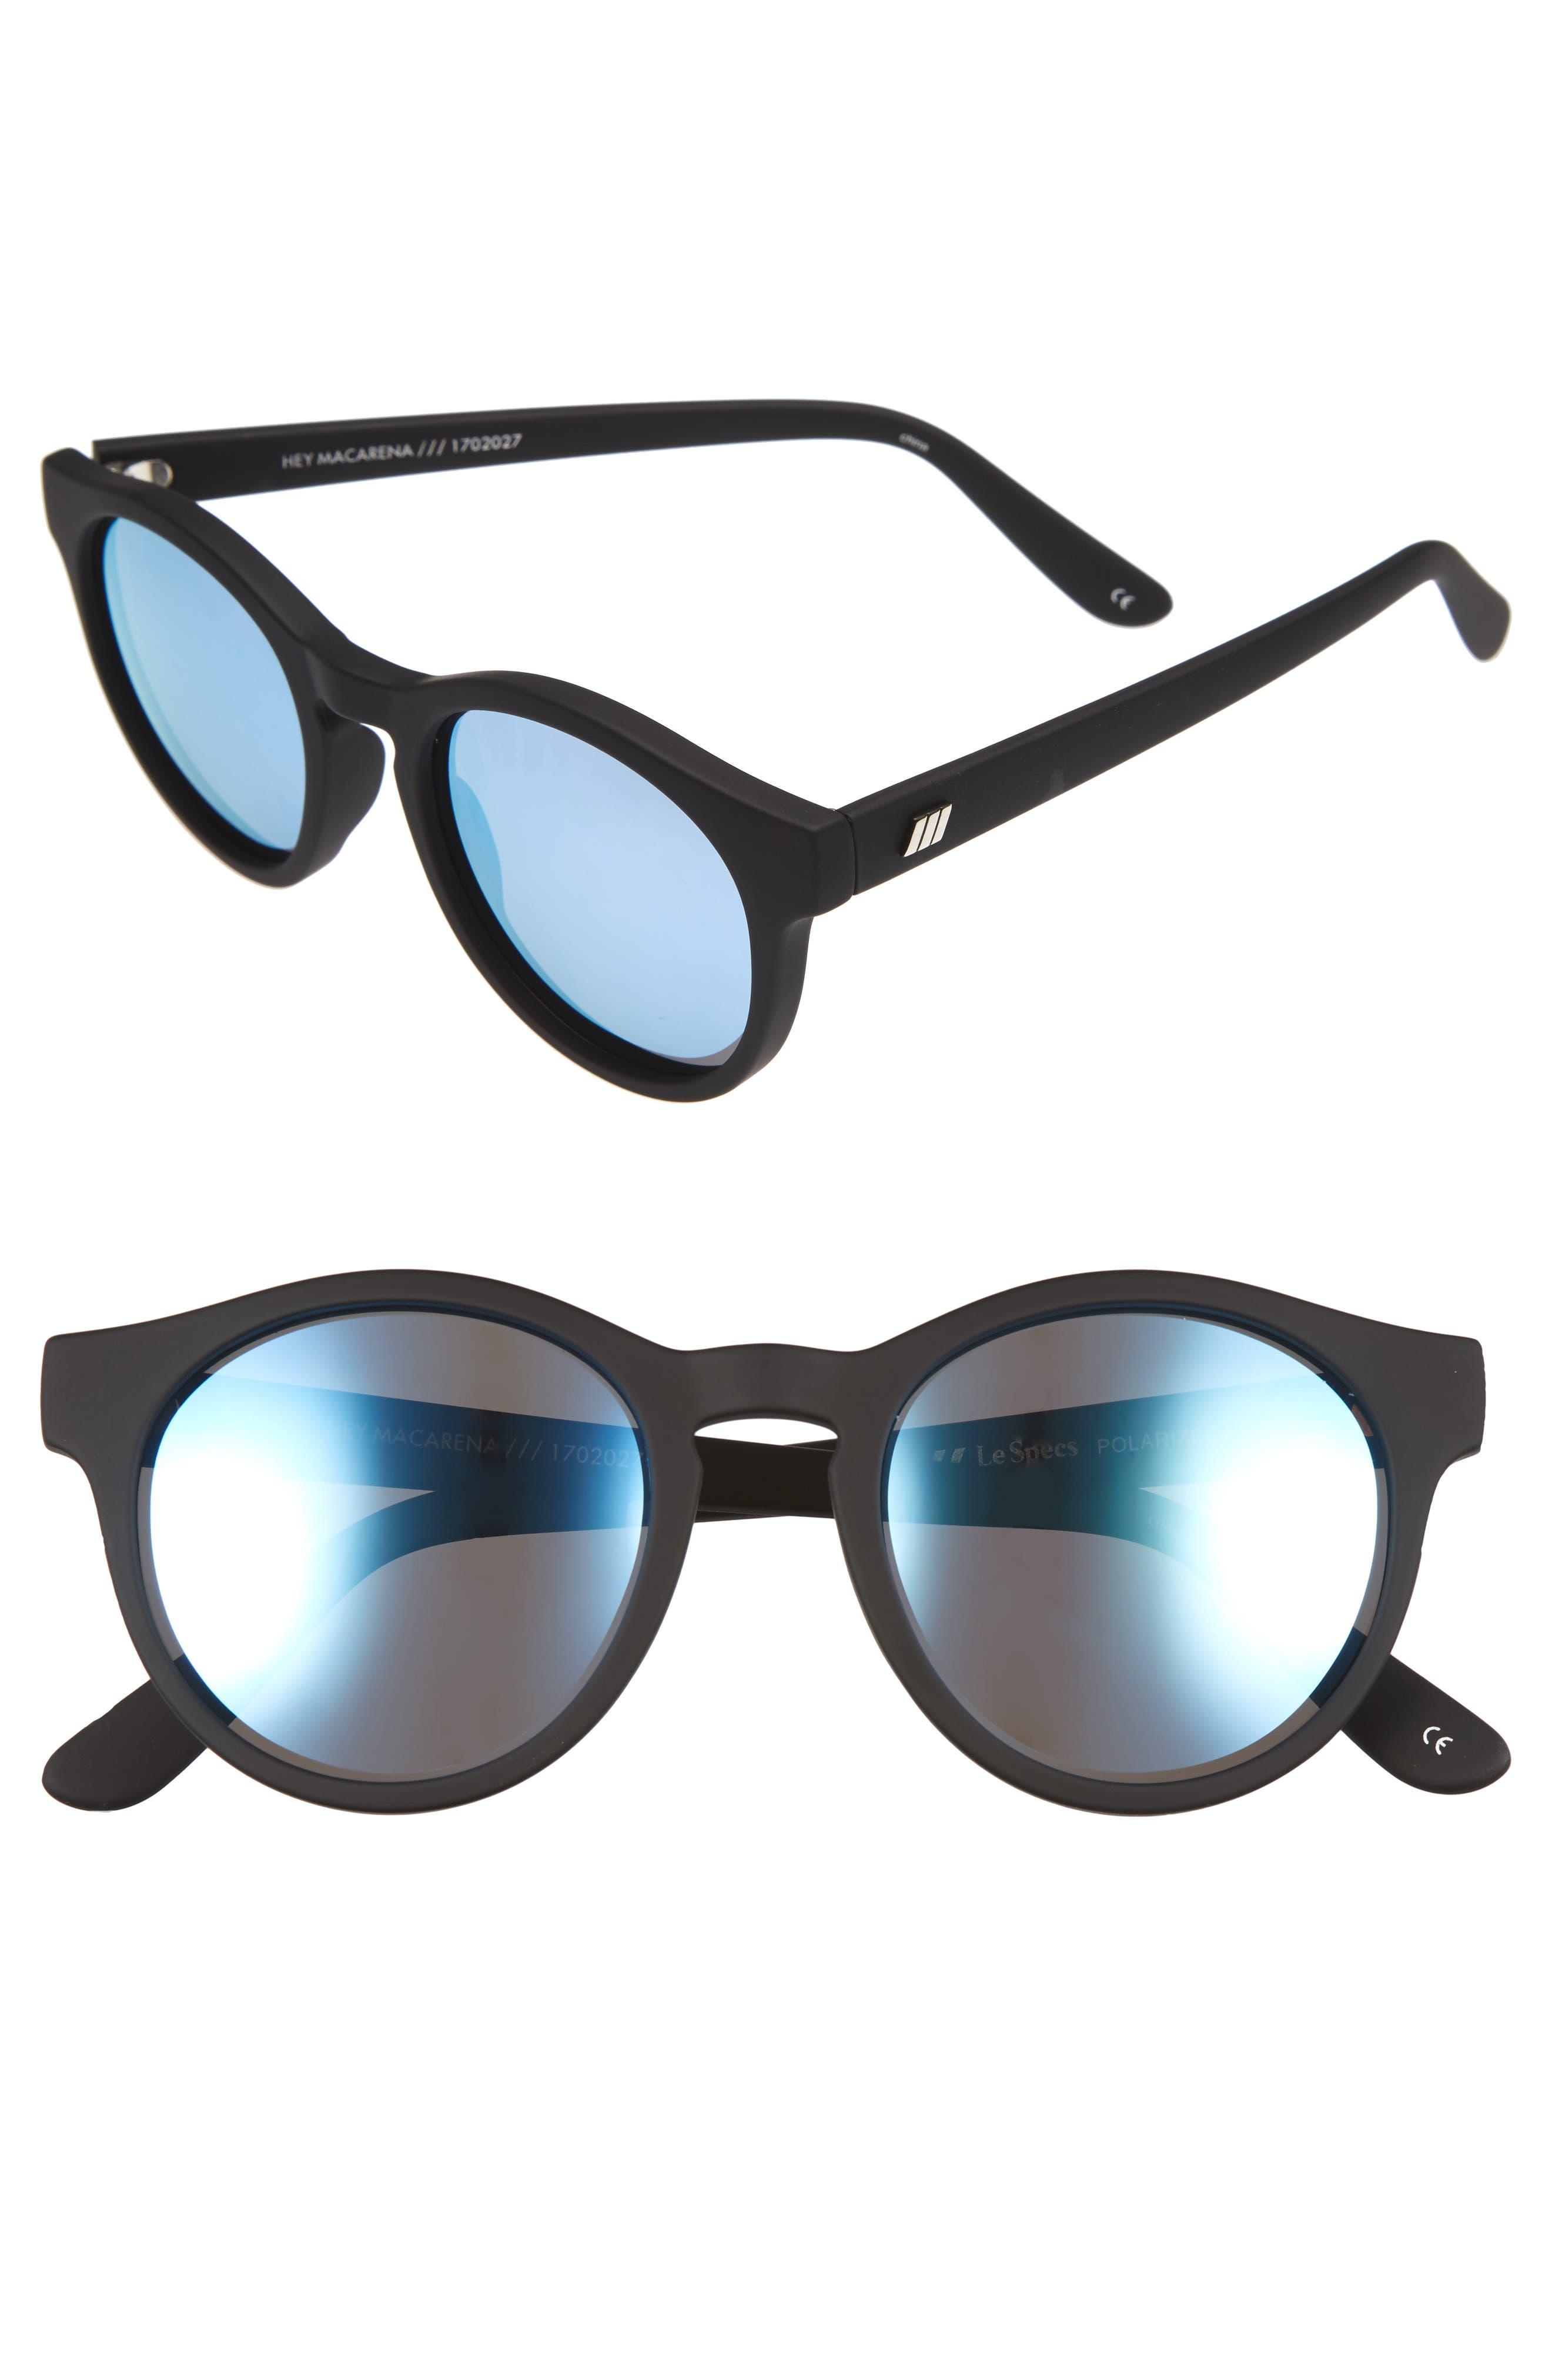 Alternate Image 1 Selected - Le Specs Hey Macarena 51mm Polarized Retro Sunglasses